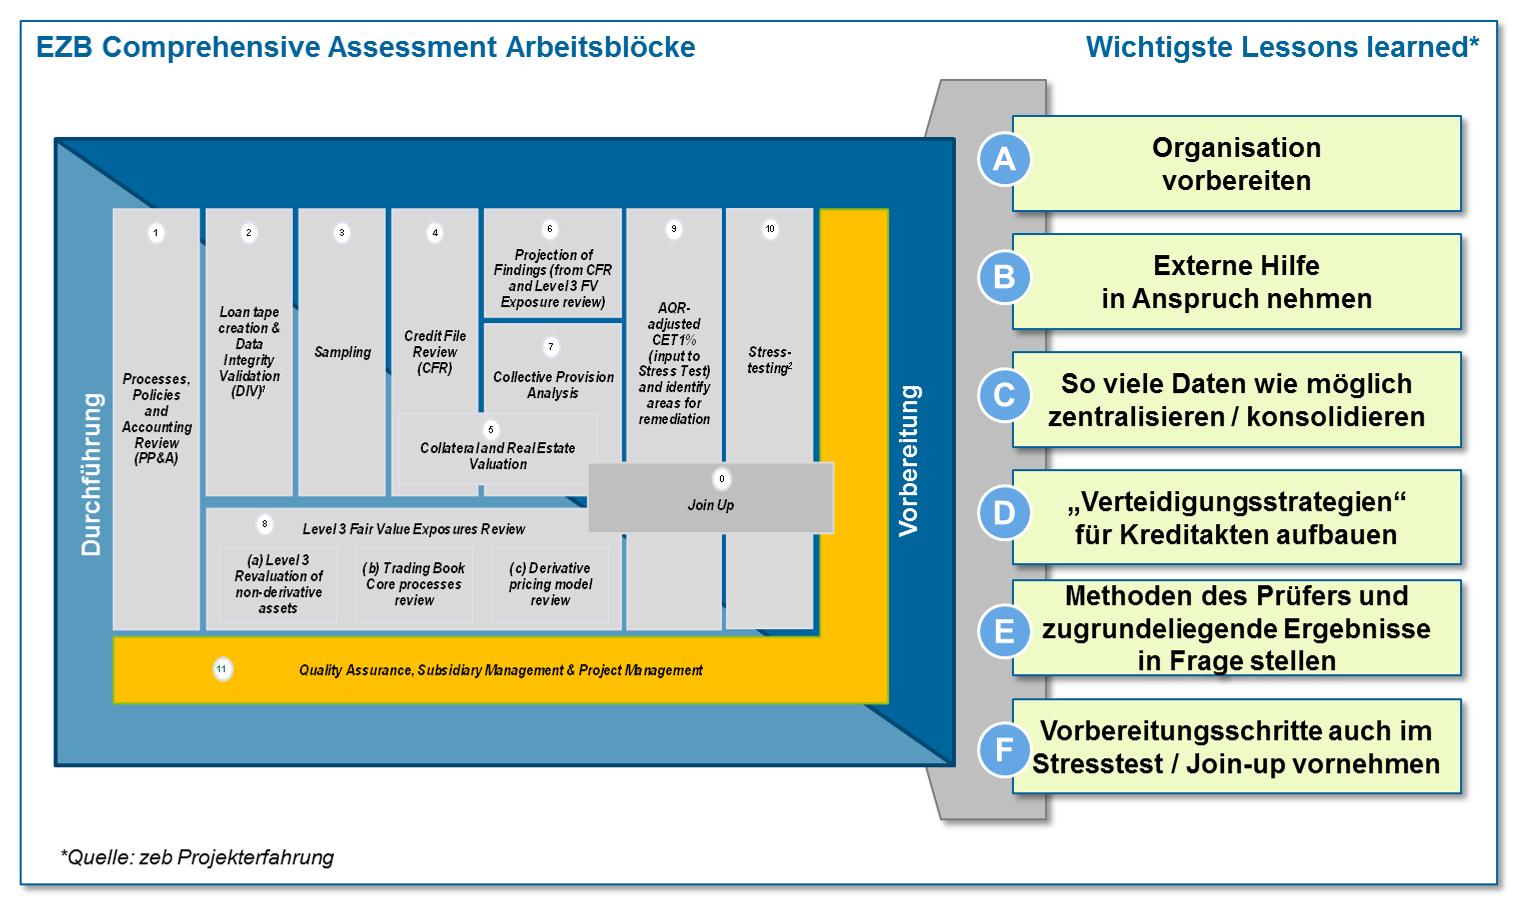 EZB Bankenaufsicht Comprehensive Assessments (CAS)—Lessons learned ...